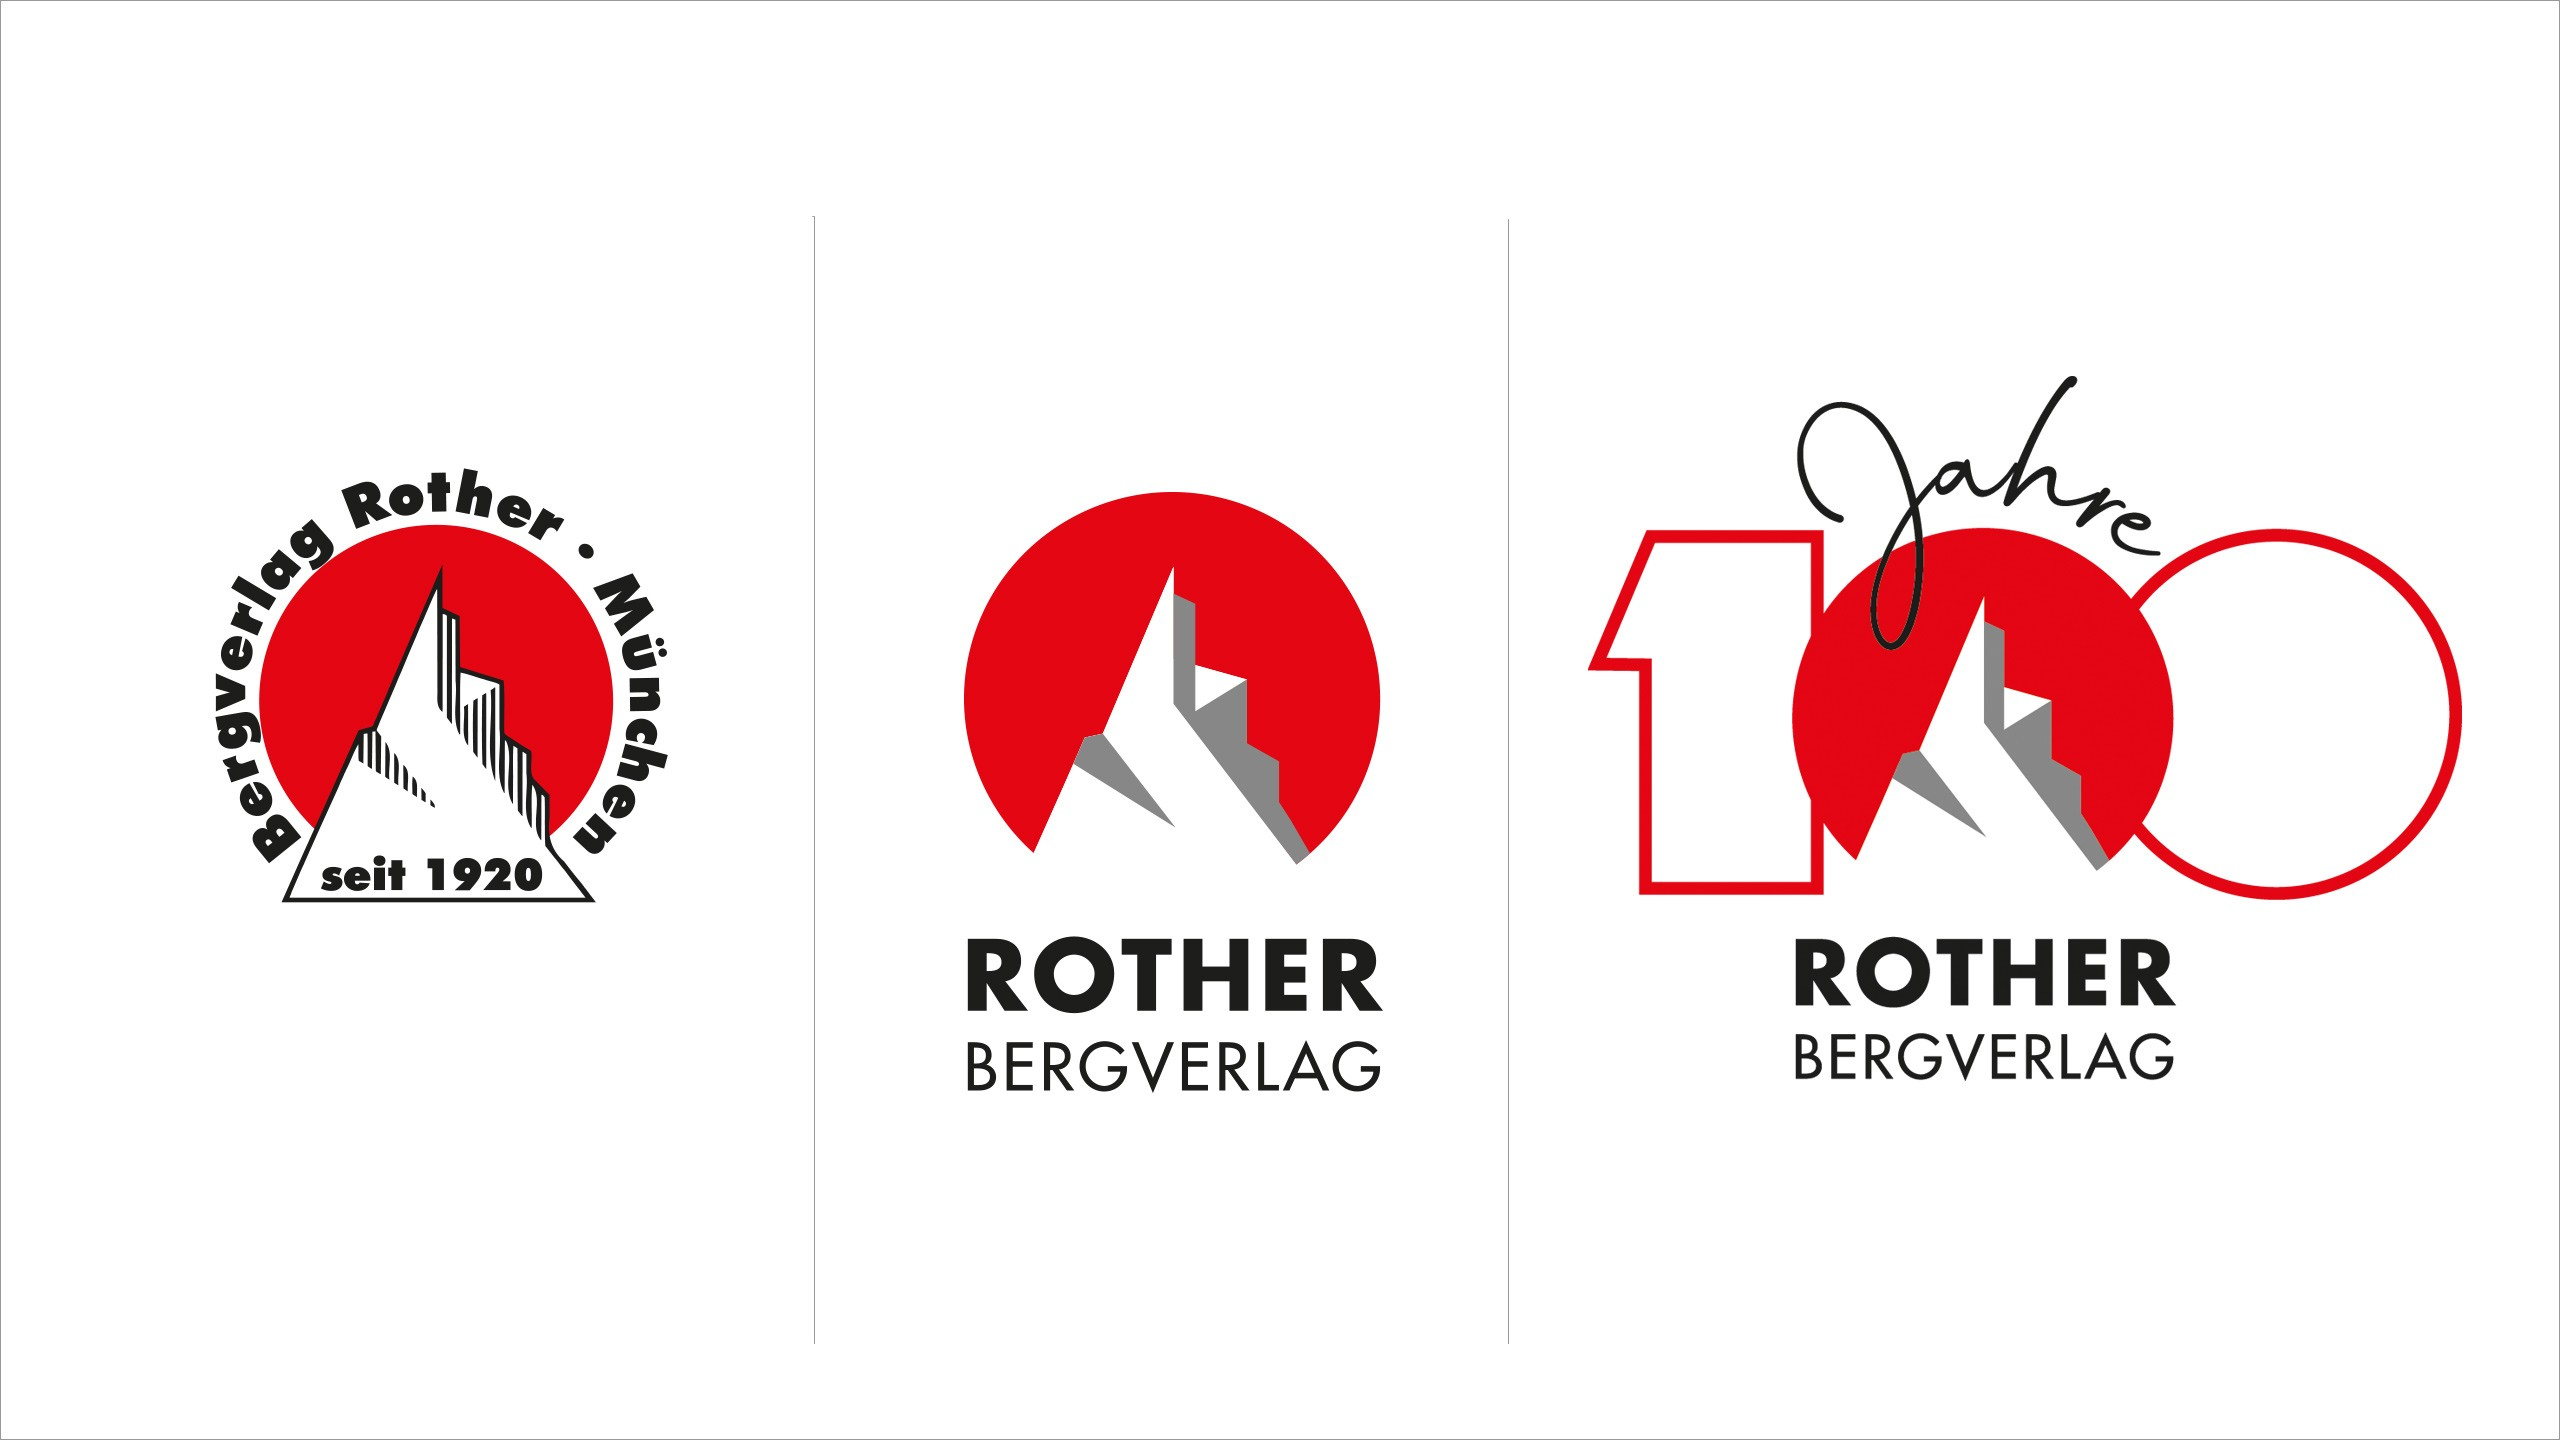 Markenlogo neu Rother Verlag + Jubiläumslogo 100 Jahre Rother Bergverlag